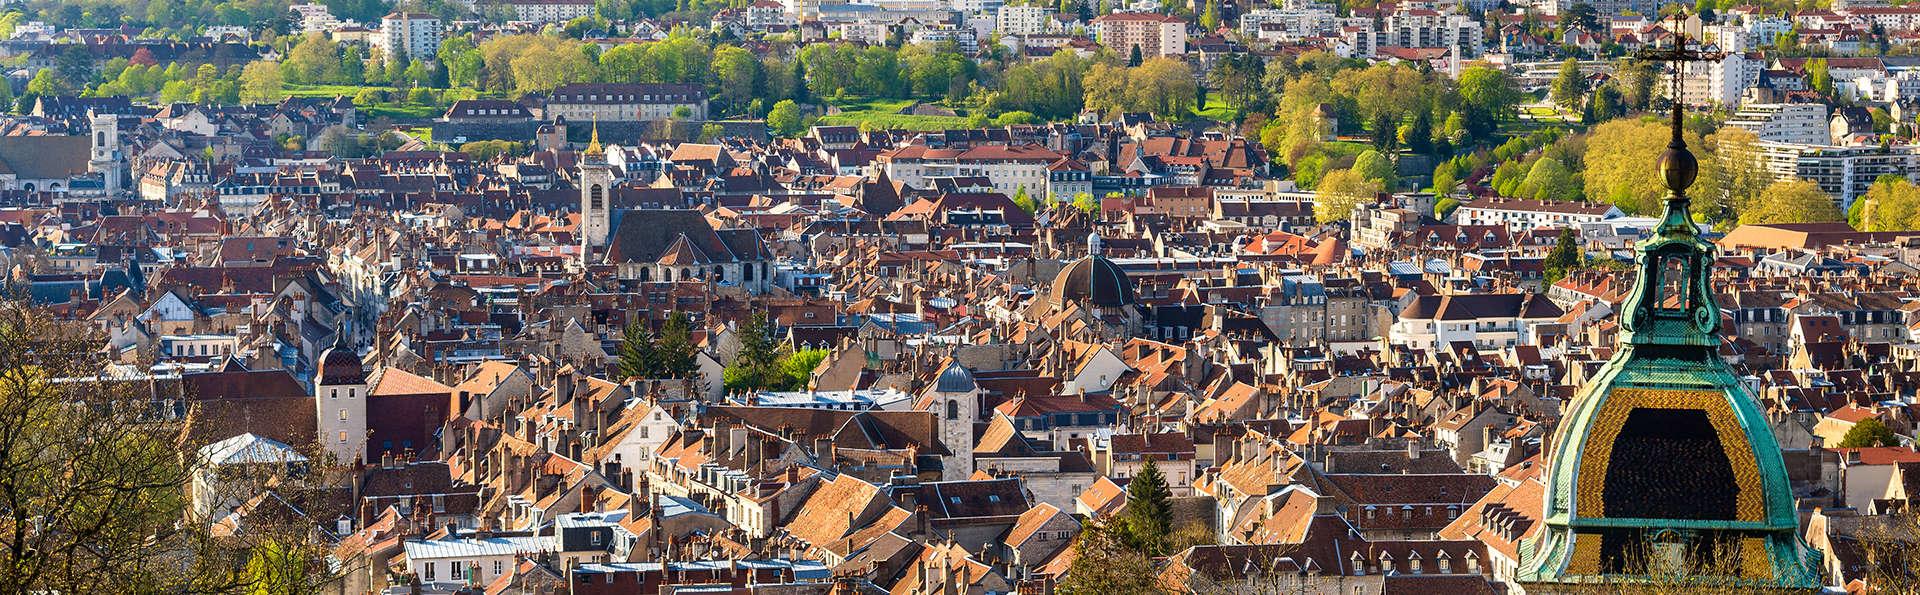 Zenitude Hôtel-Résidences La City - Edit_Besancon3.jpg